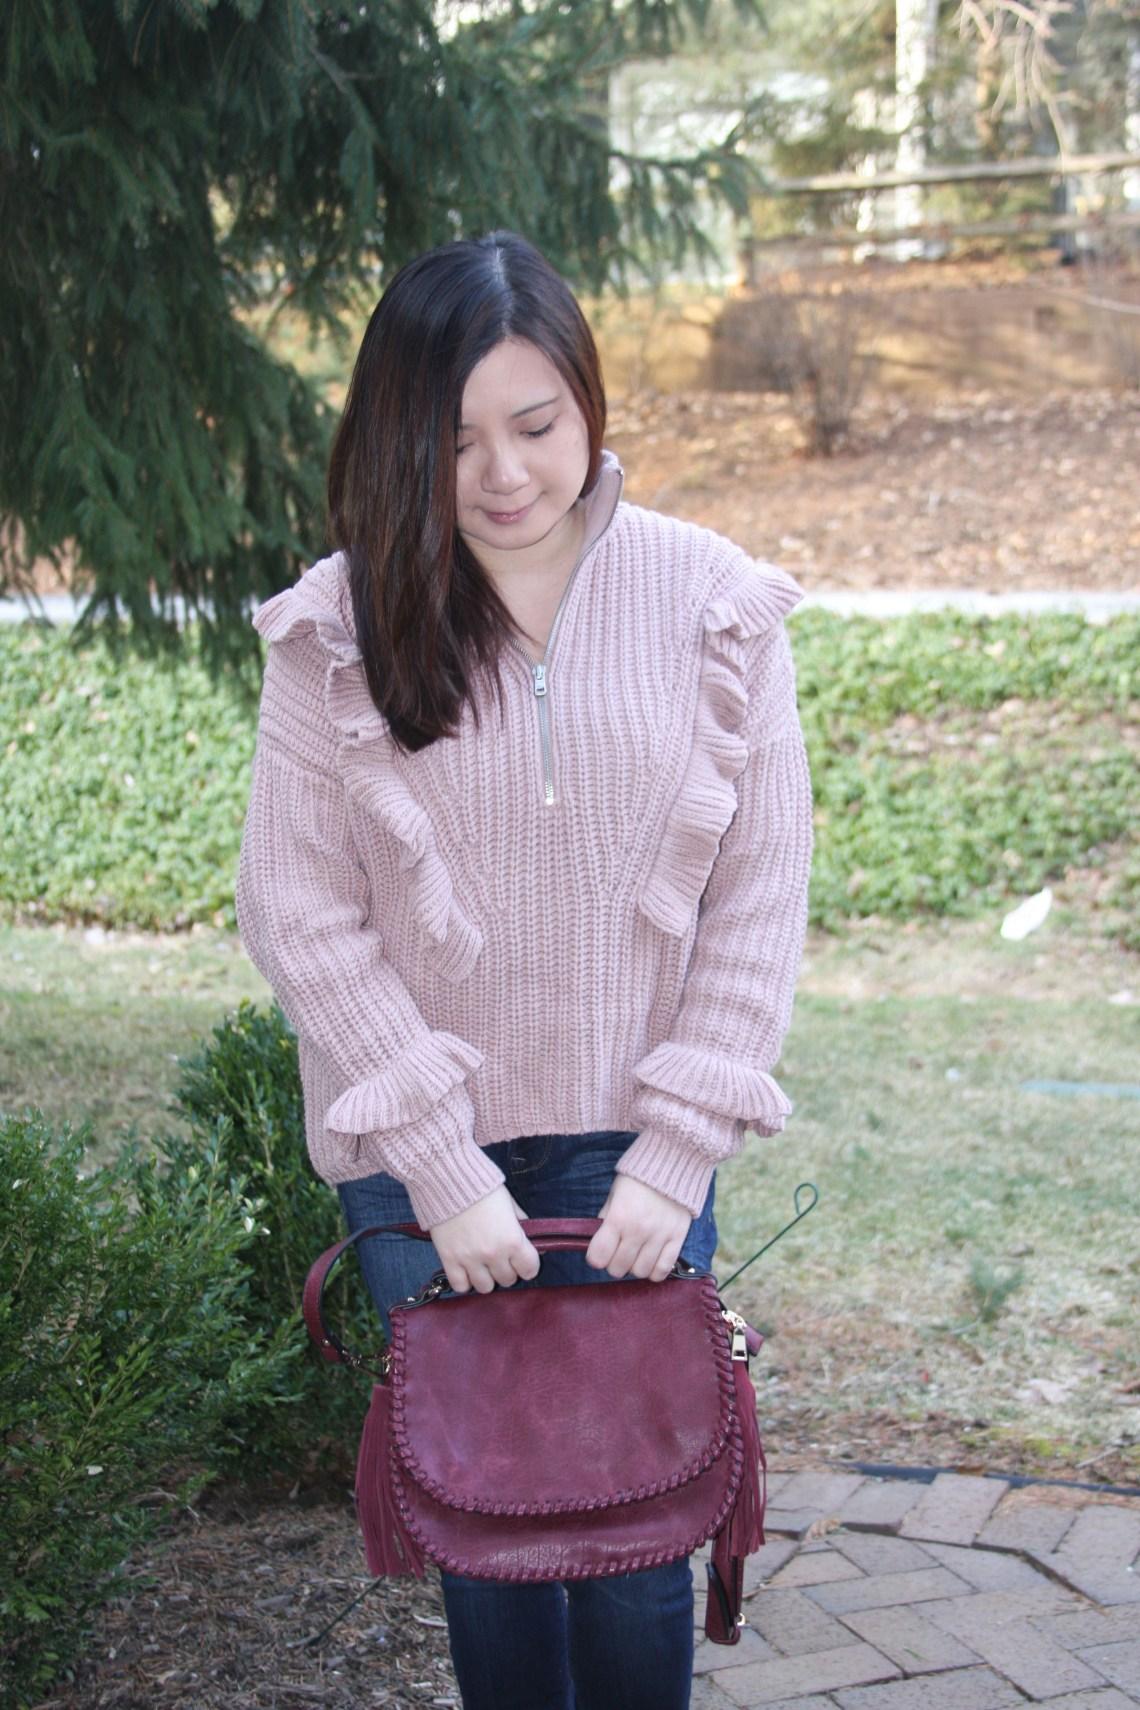 Whip Stitch Saddle Bag